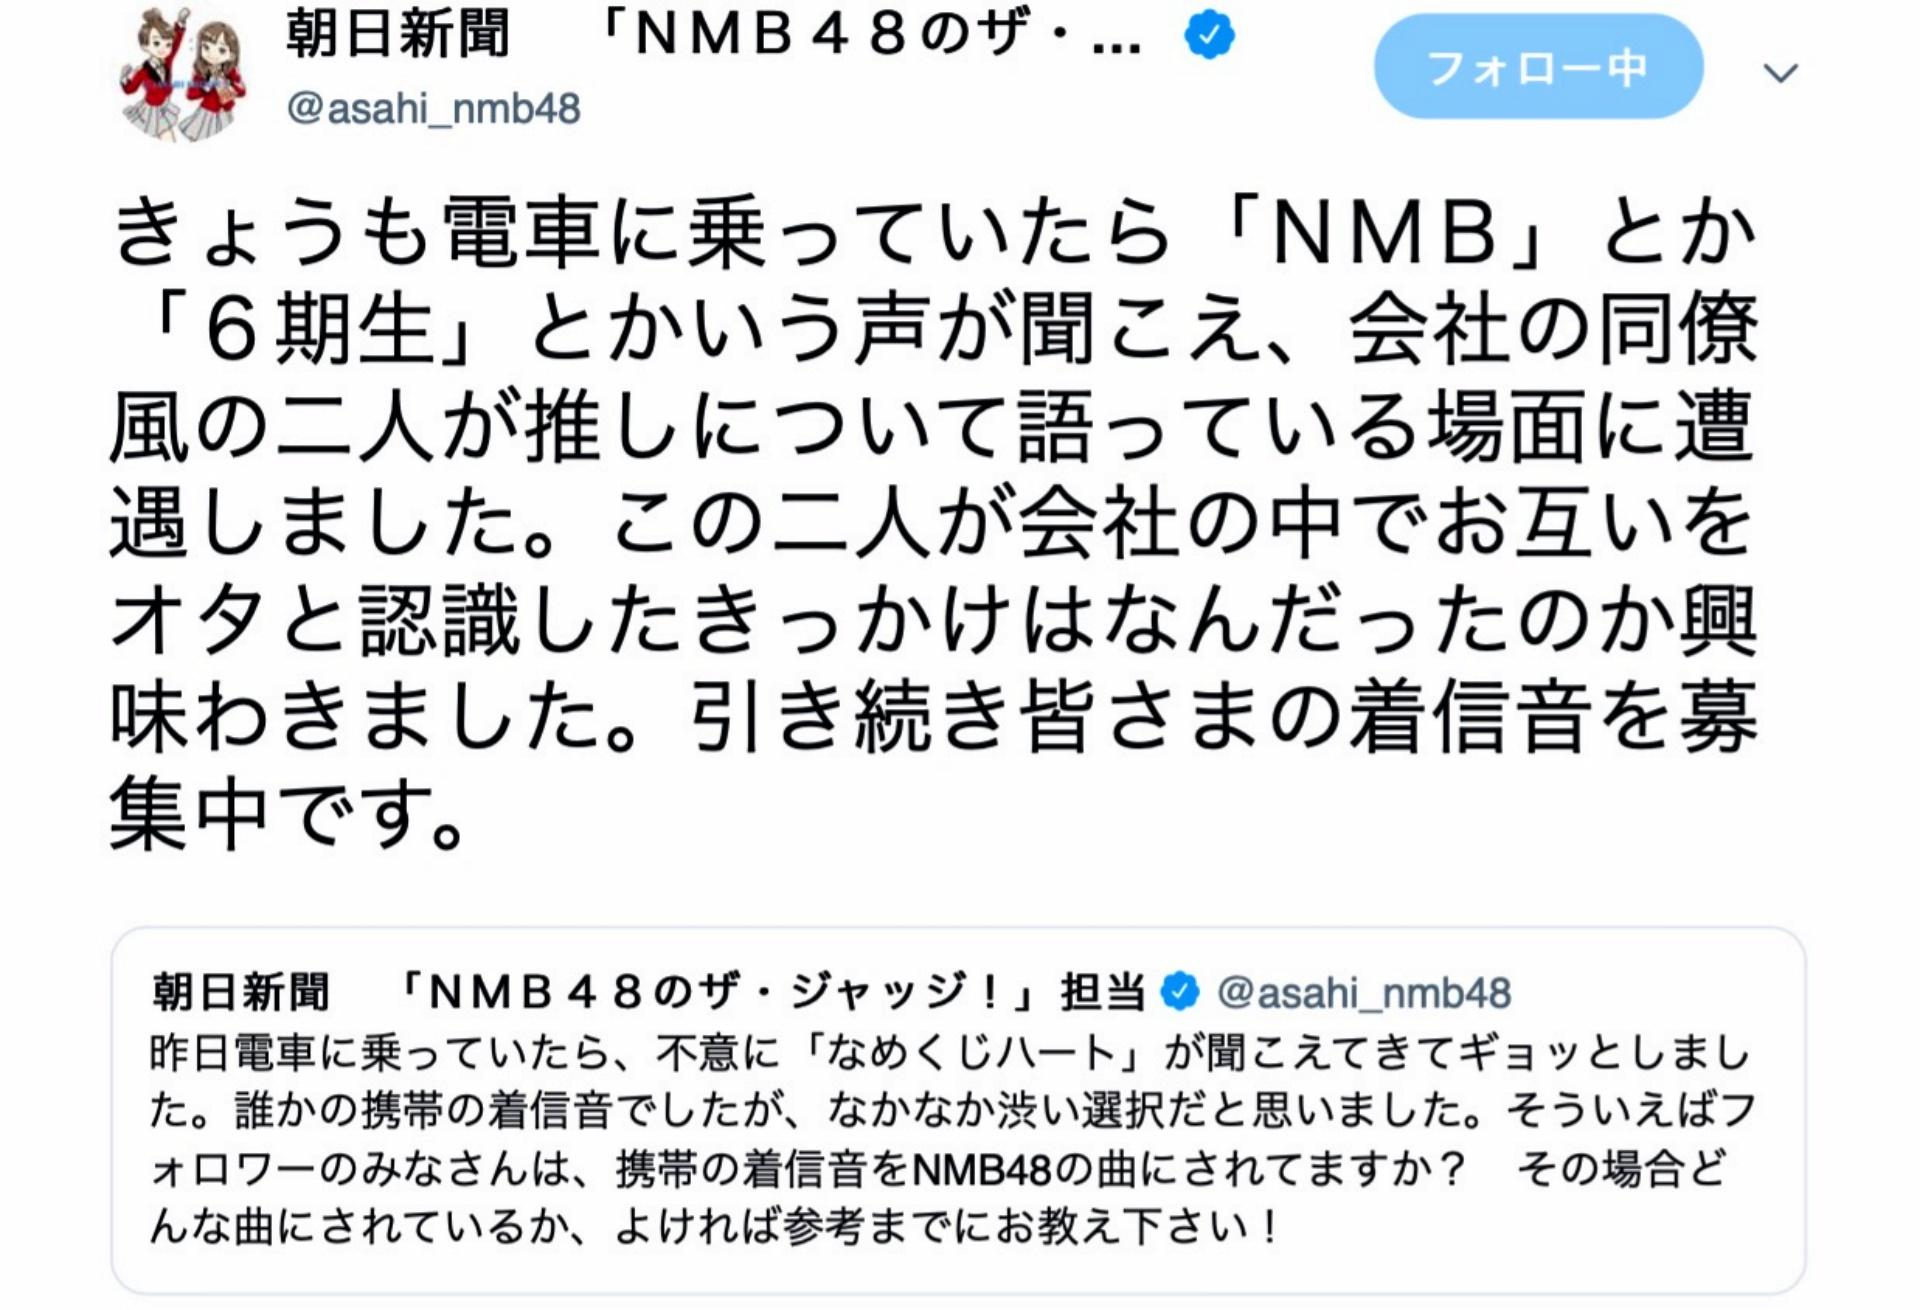 【NMB48】朝日新聞「NMB48のザ・ジャッジ!」担当さんが募ったNMB48楽曲着信音ランキング中間発表